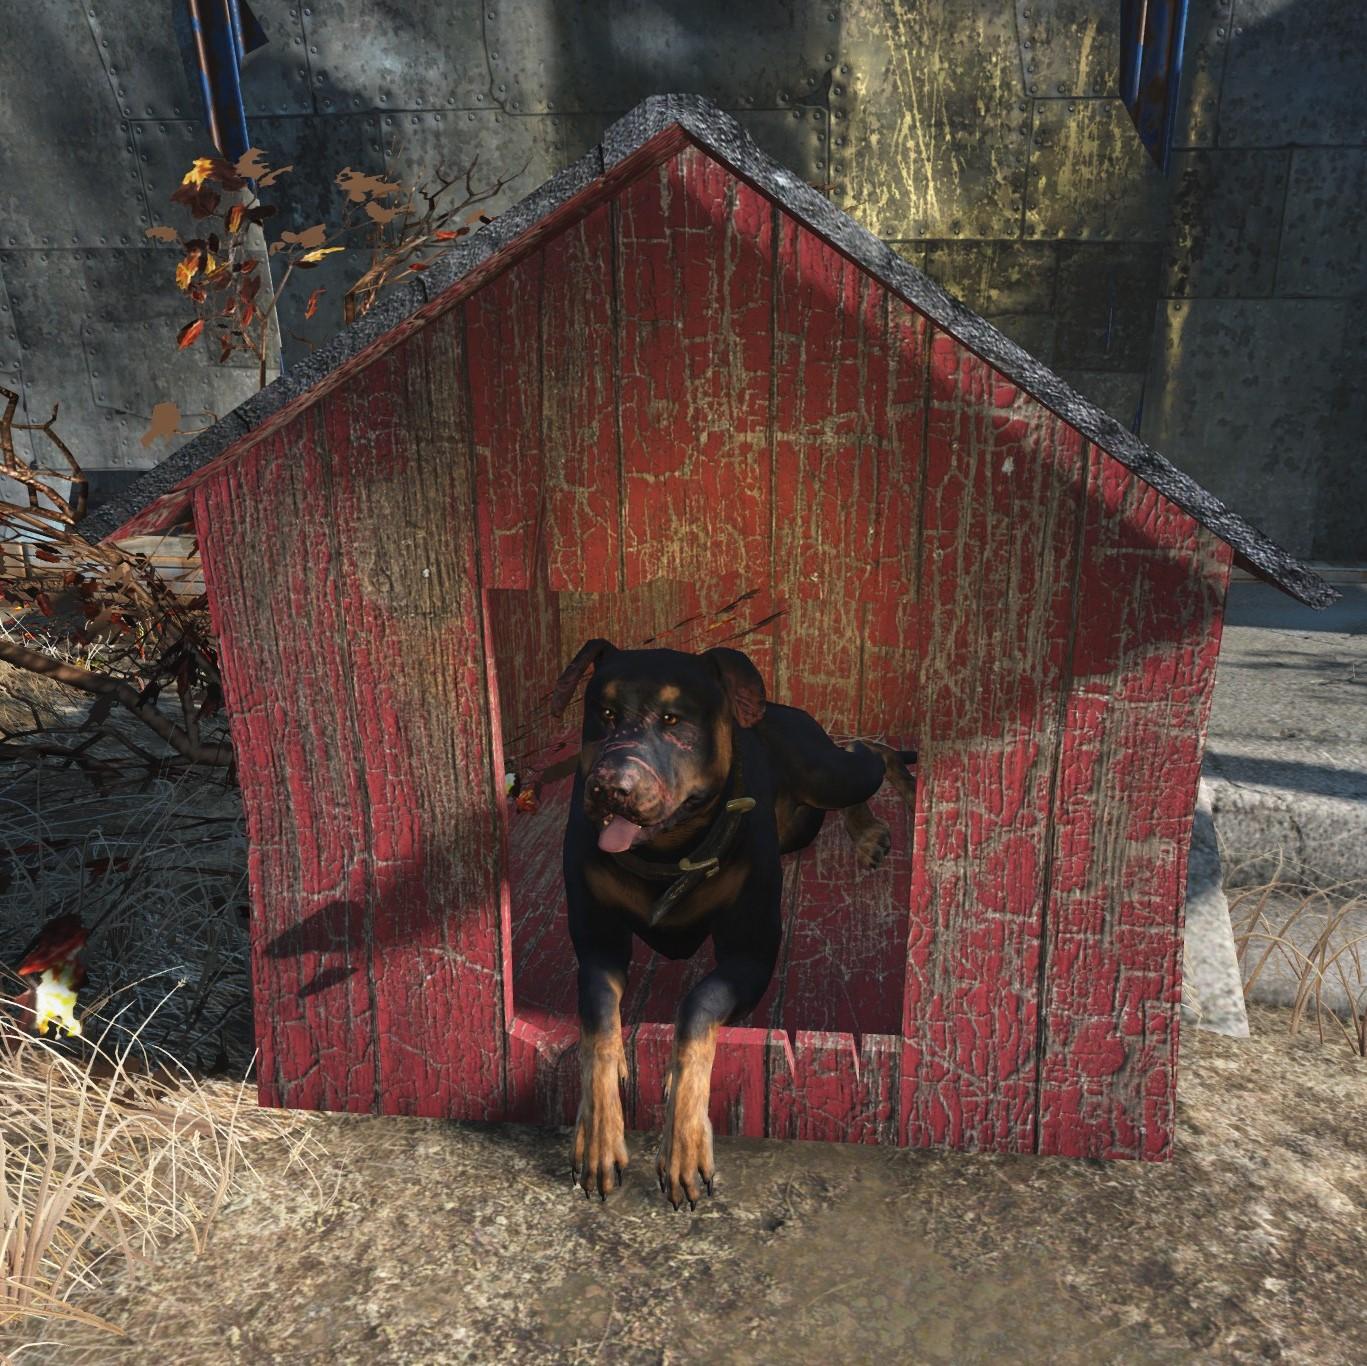 junkyard dog fallout wiki fandom powered by wikia